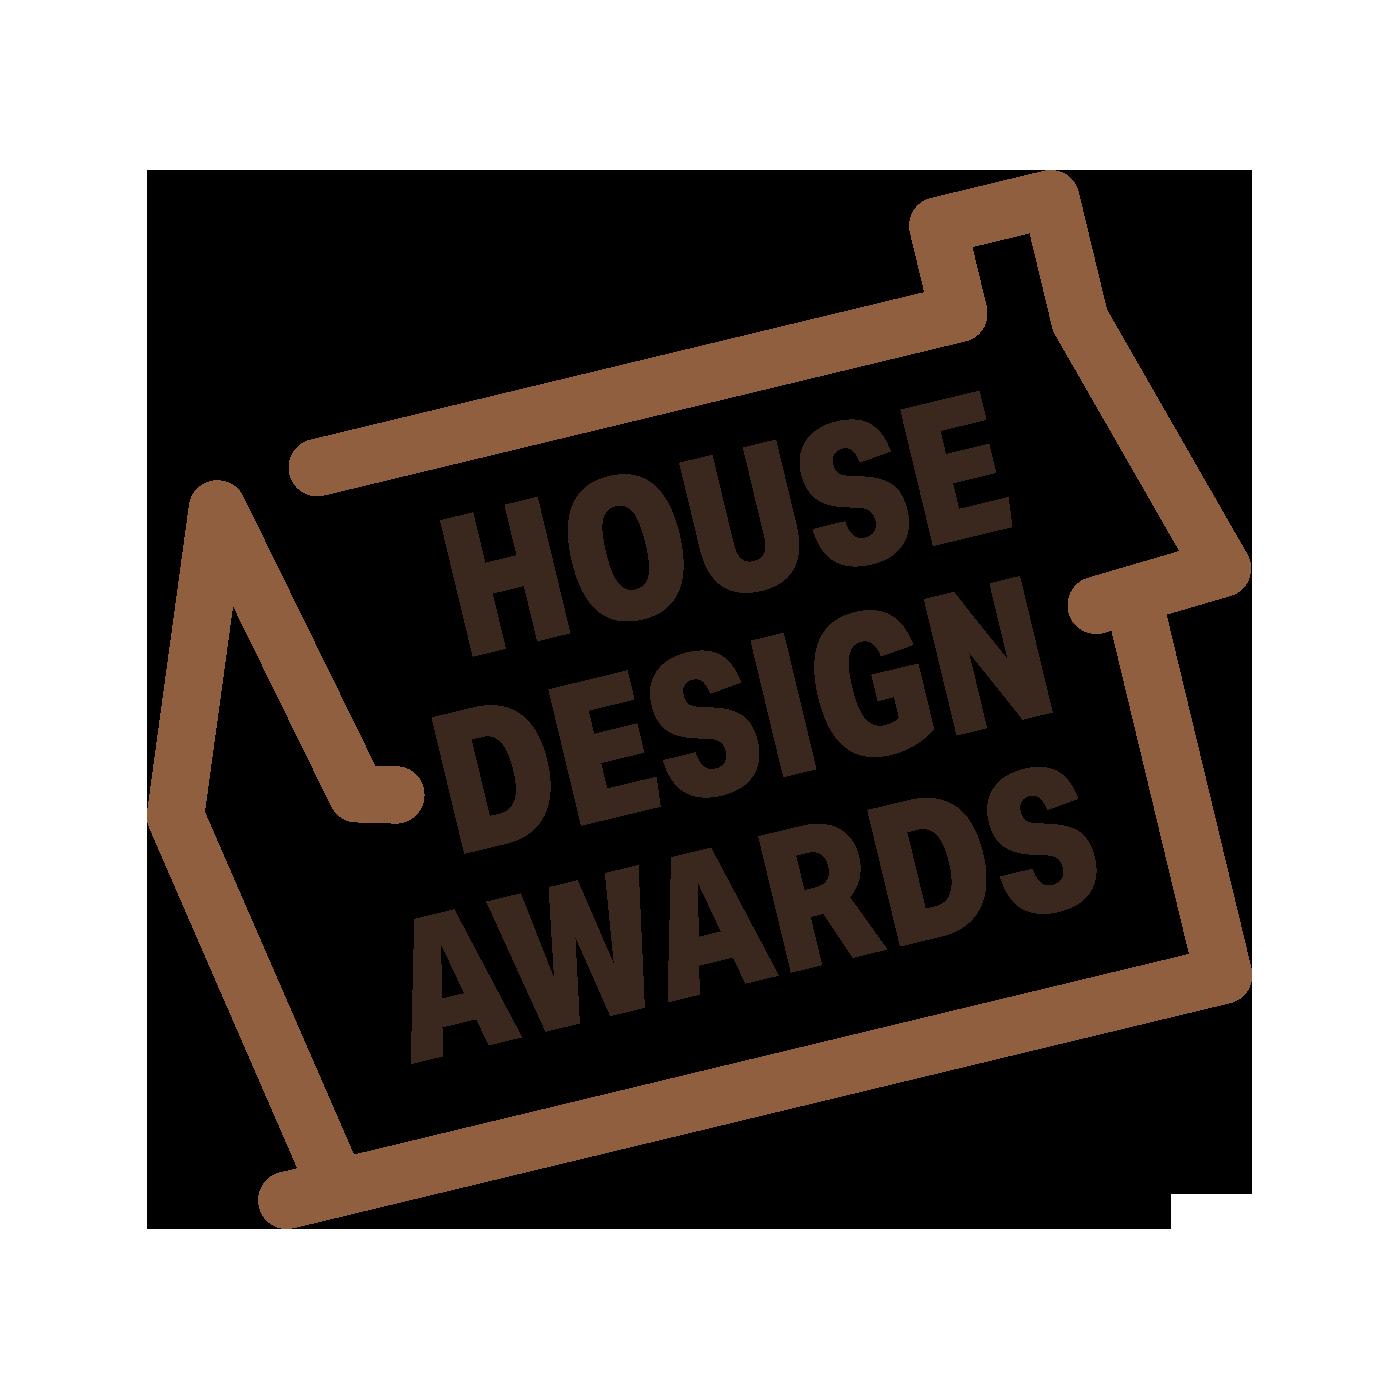 House Design Awards logo